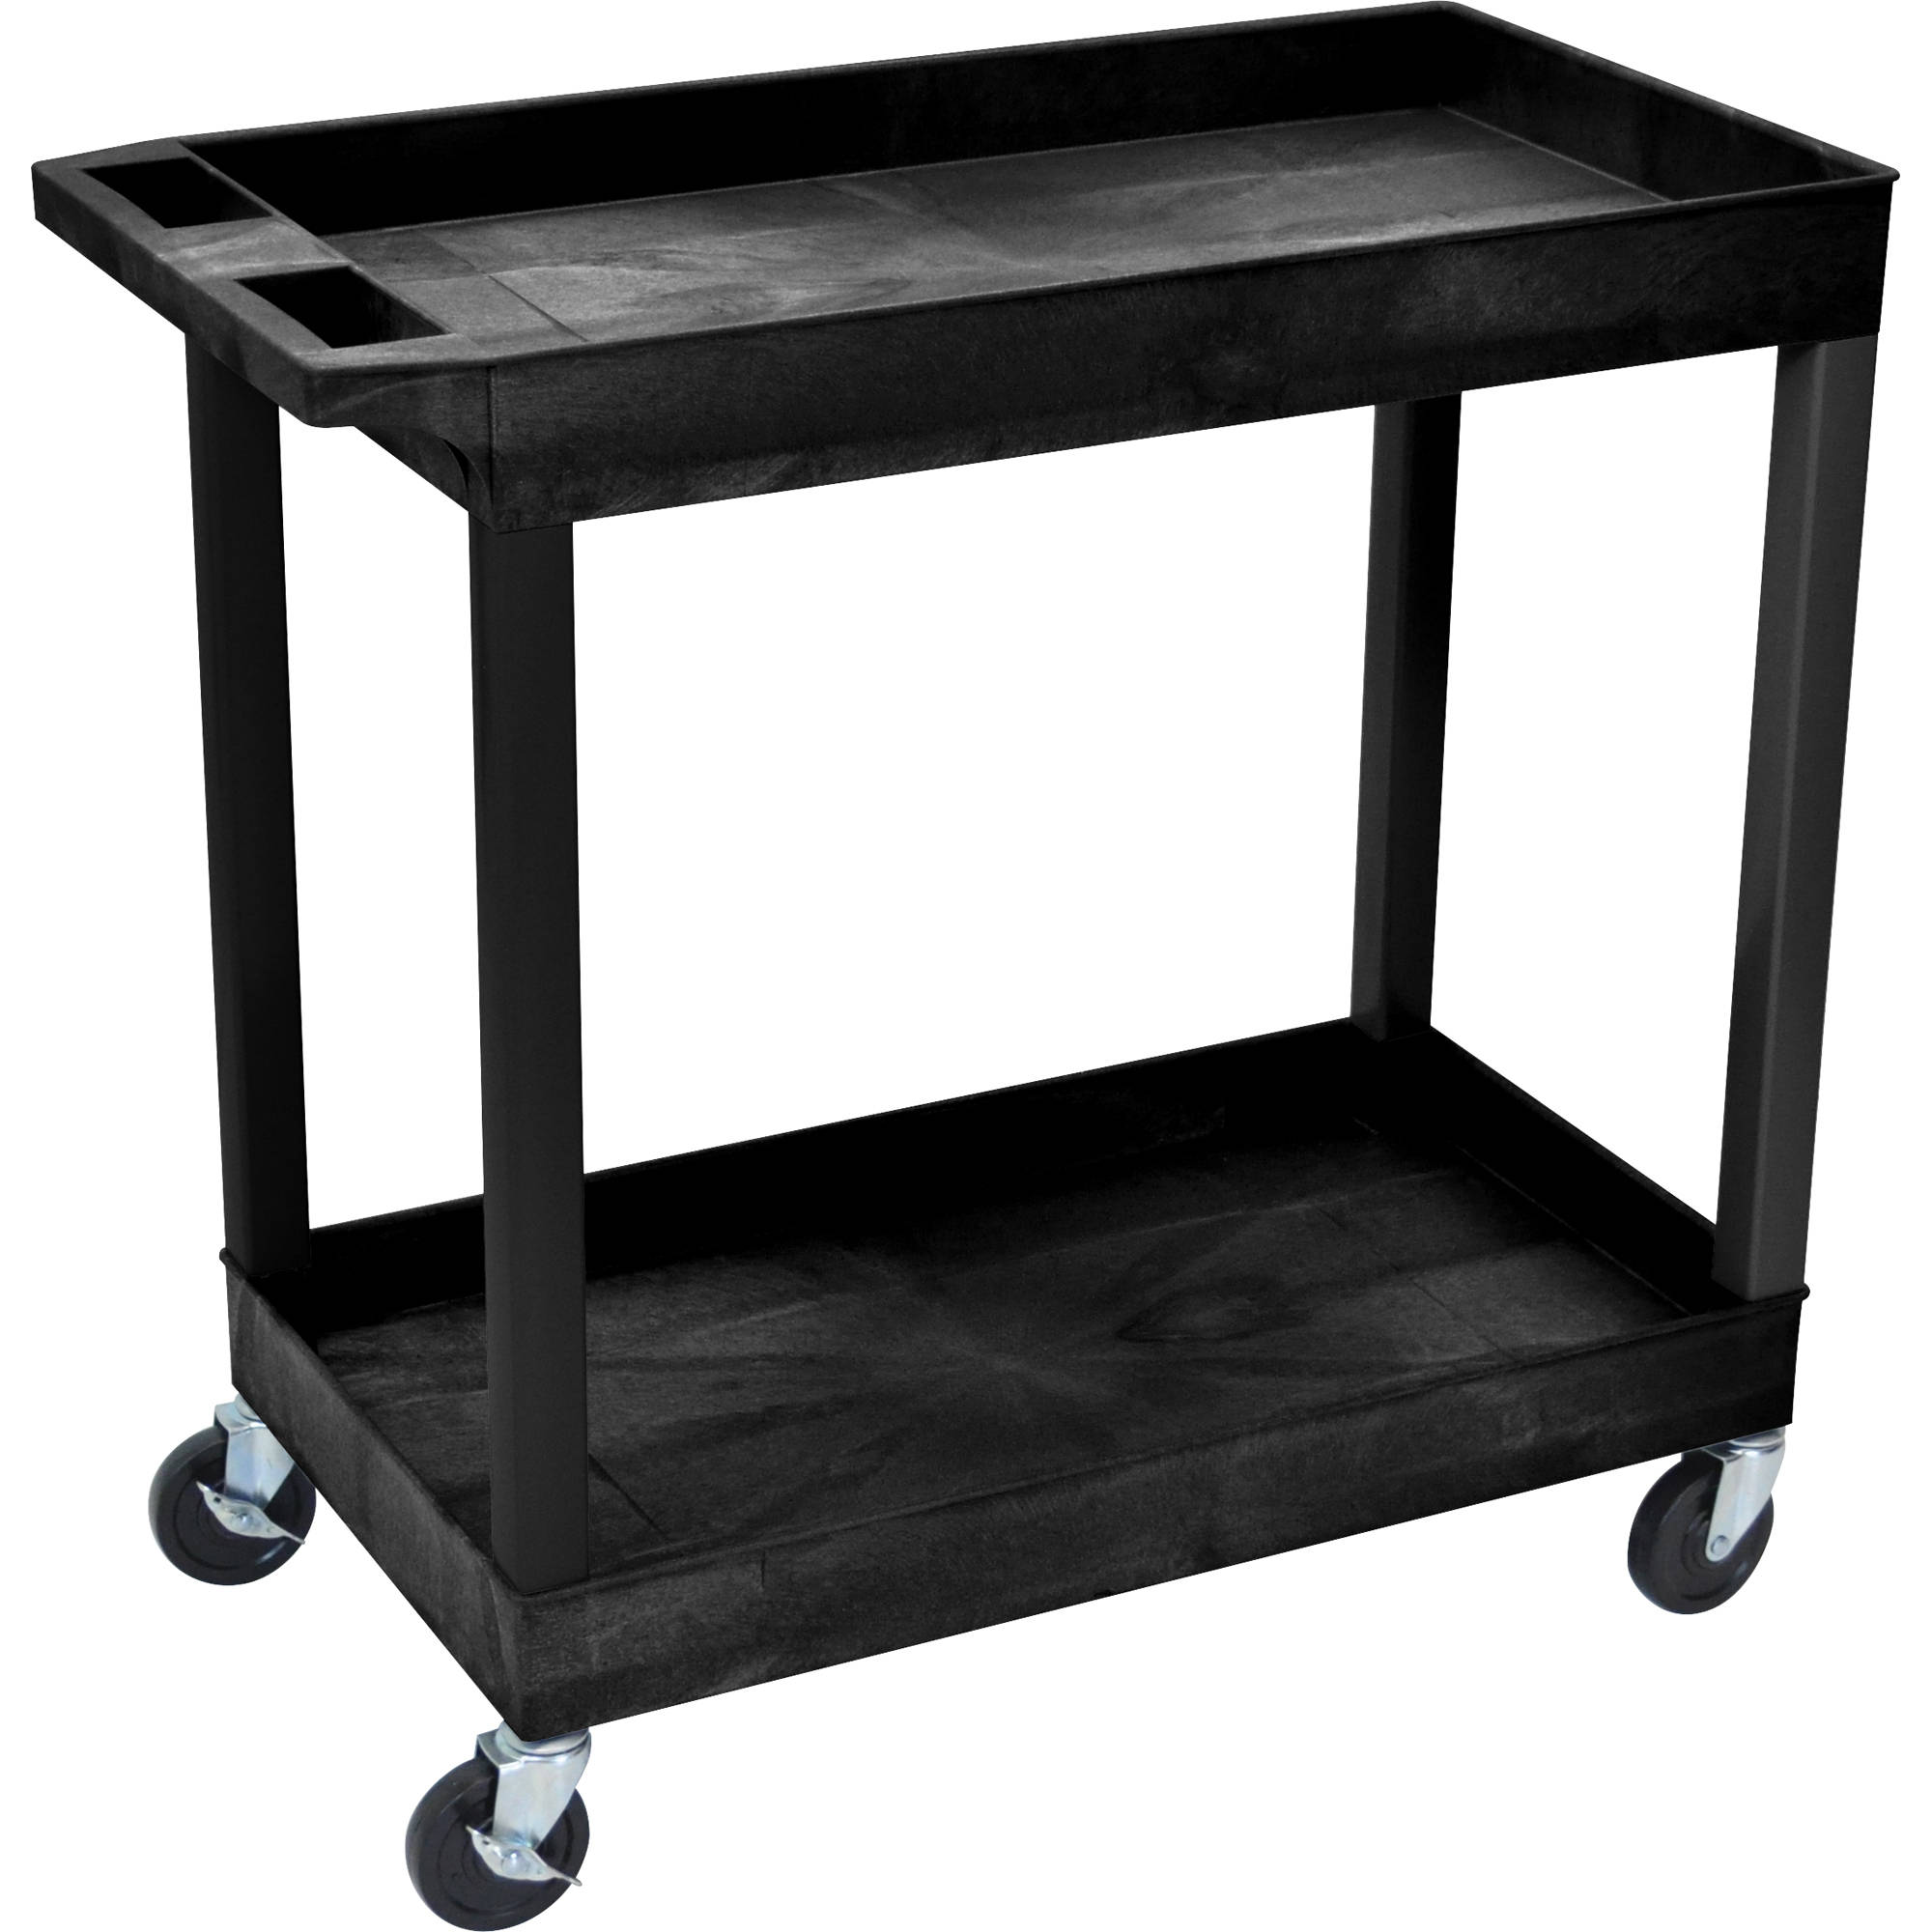 luxor 32 x 18 two shelf utility cart black luxor 32 x 18 two shelf